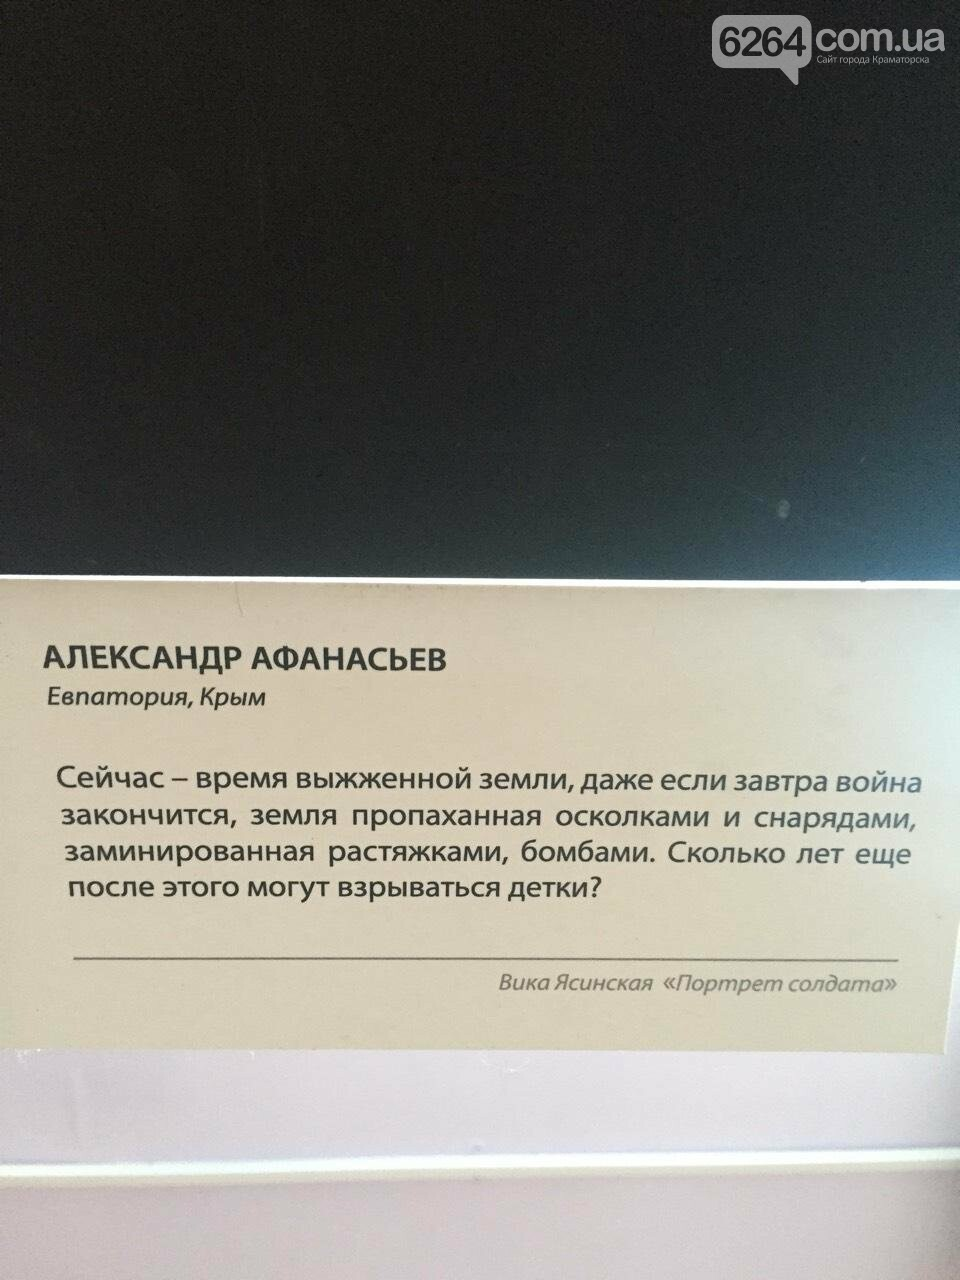 В Краматорске проходит выставка «Портрет солдата», фото-7